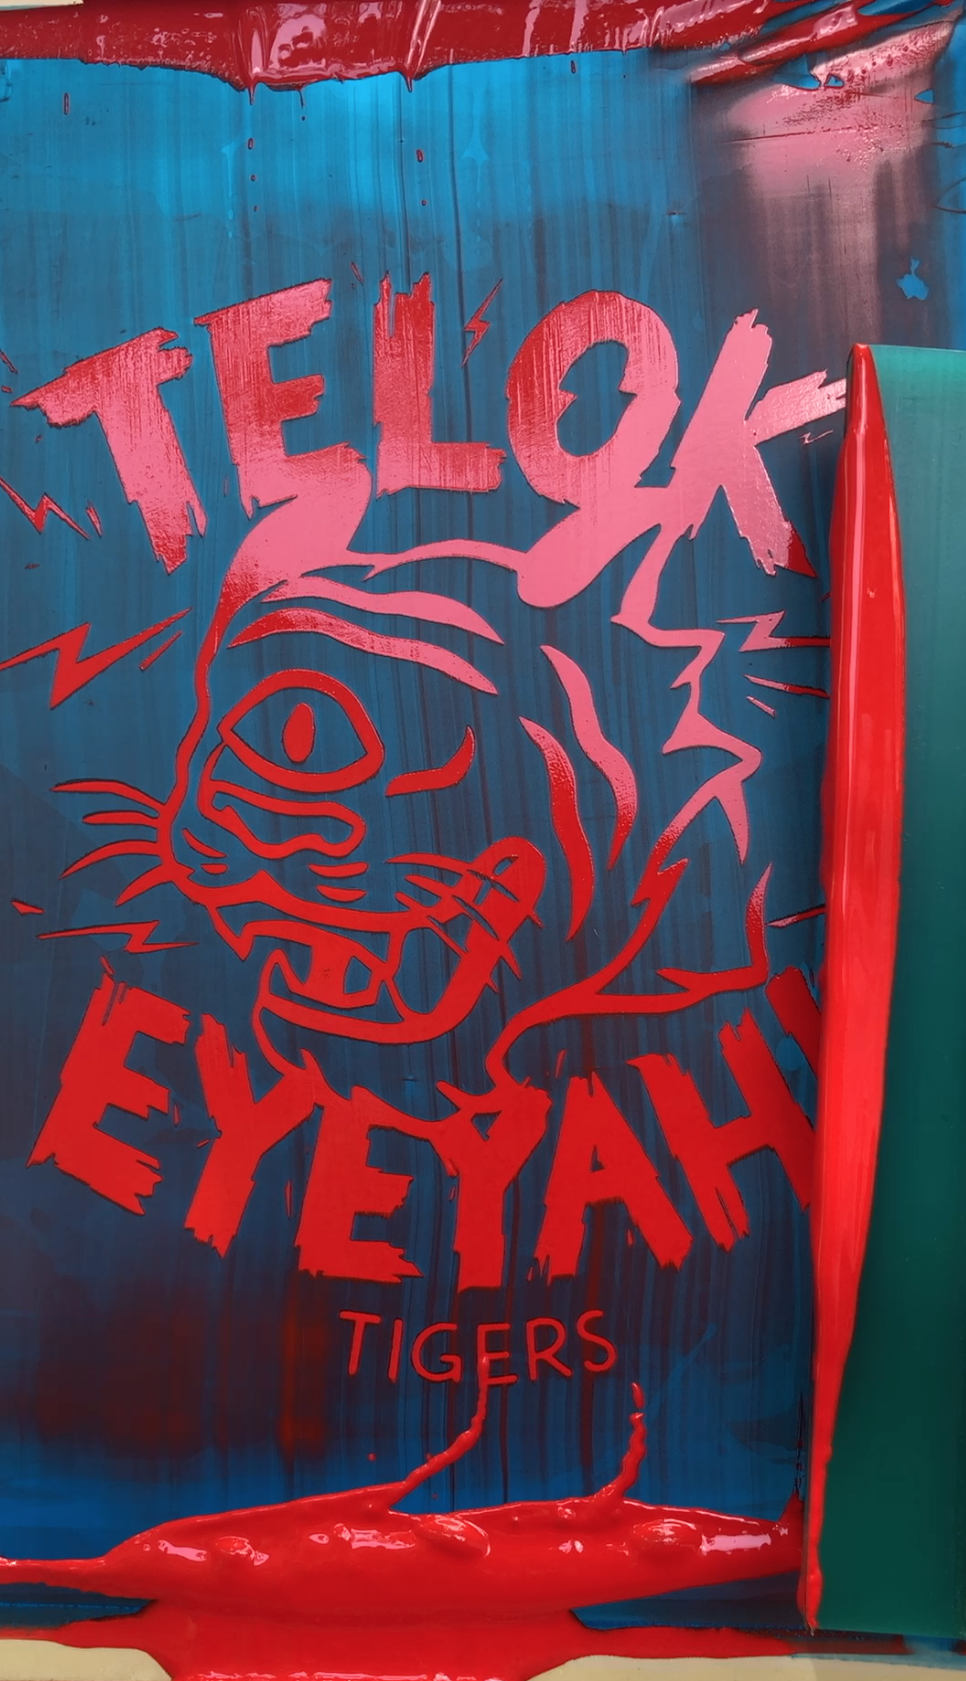 Telok EYEYAH! Tigers - a limited edition National Day design